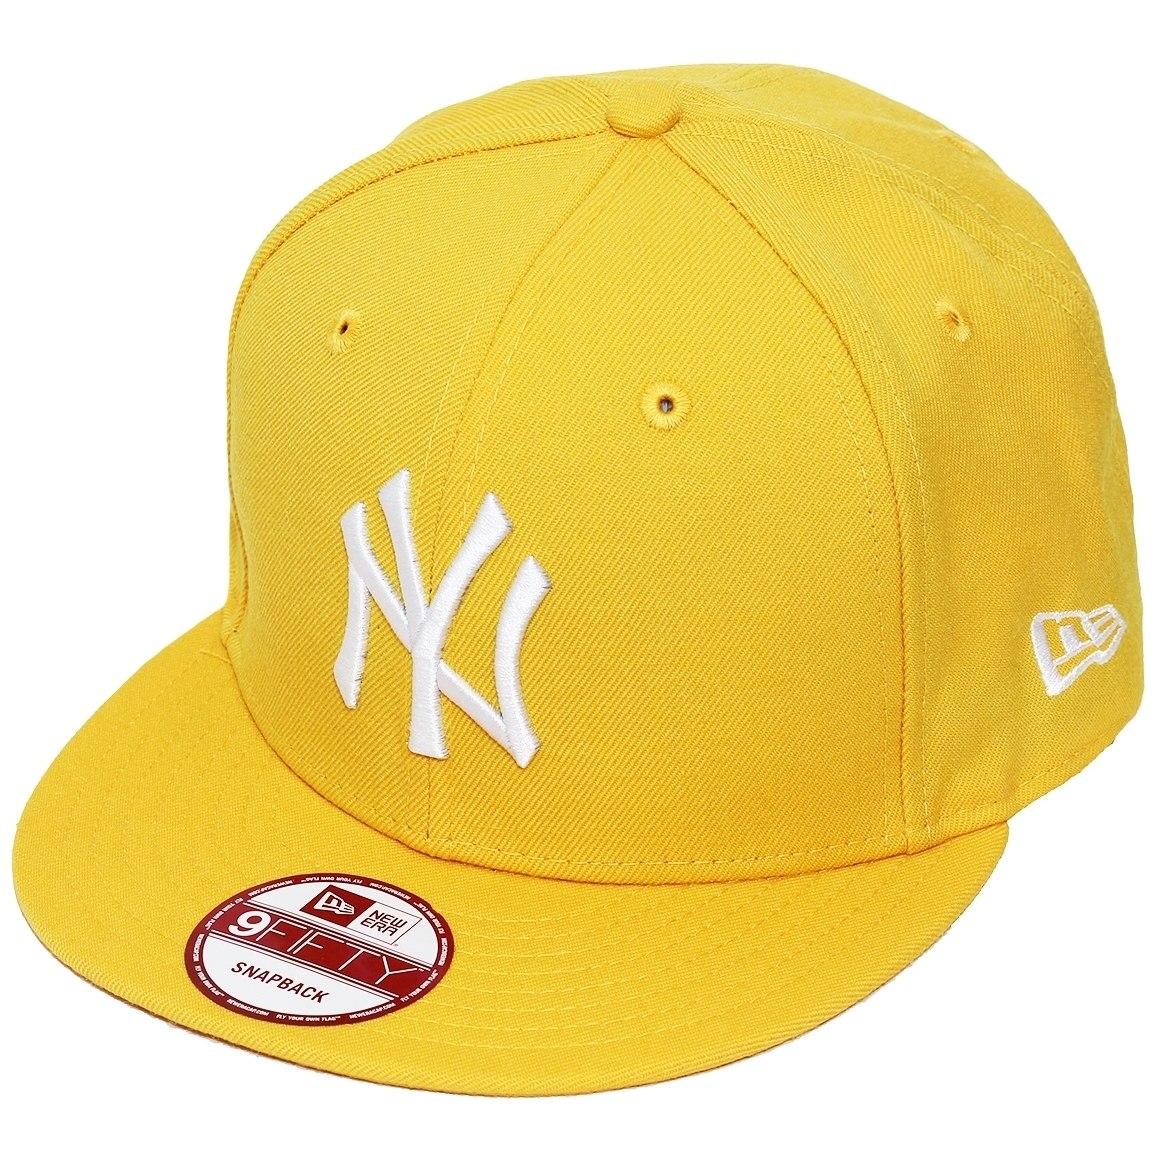 5b95dd4c3fbec boné new era aba reta snapback mlb ny yankees colors amarelo. Carregando  zoom.